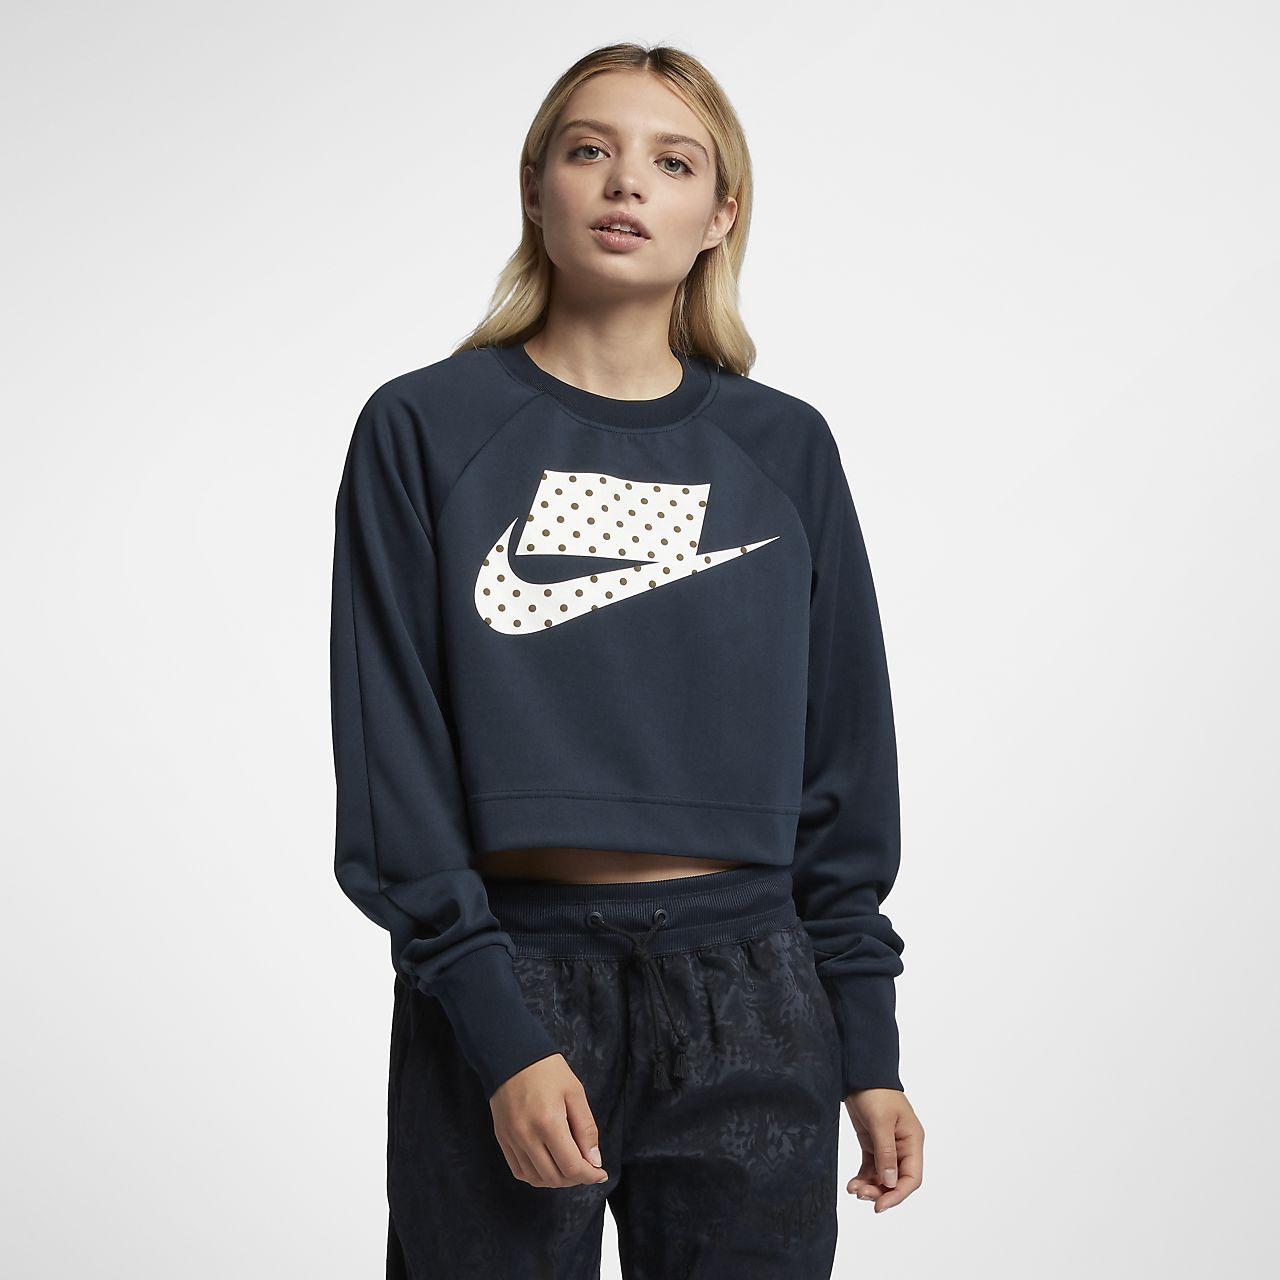 48a2ef600485 Haut court Nike Sportswear pour Femme. Nike.com FR